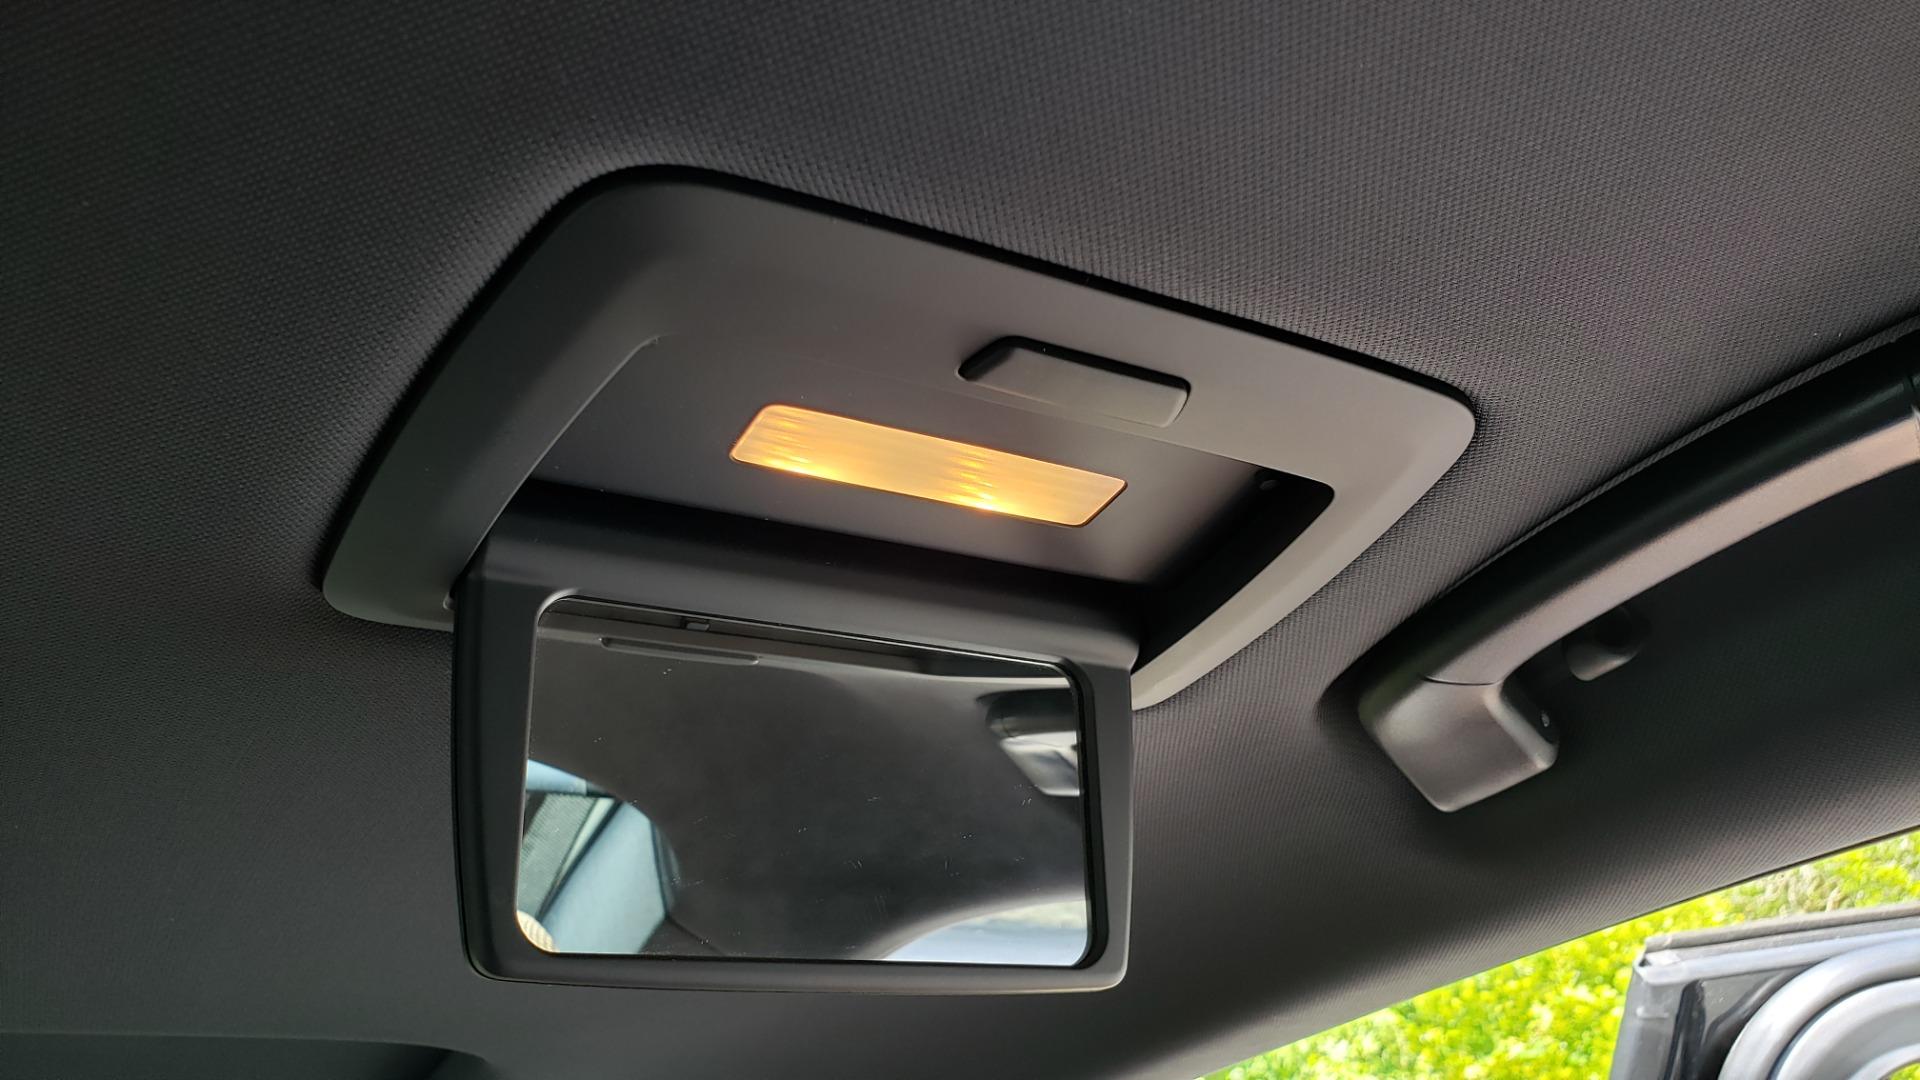 Used 2014 BMW 7 SERIES 750LI M-SPORT / EXEC PKG / DRVR ASST / LIGHTING / NAV / SUNROOF for sale Sold at Formula Imports in Charlotte NC 28227 76